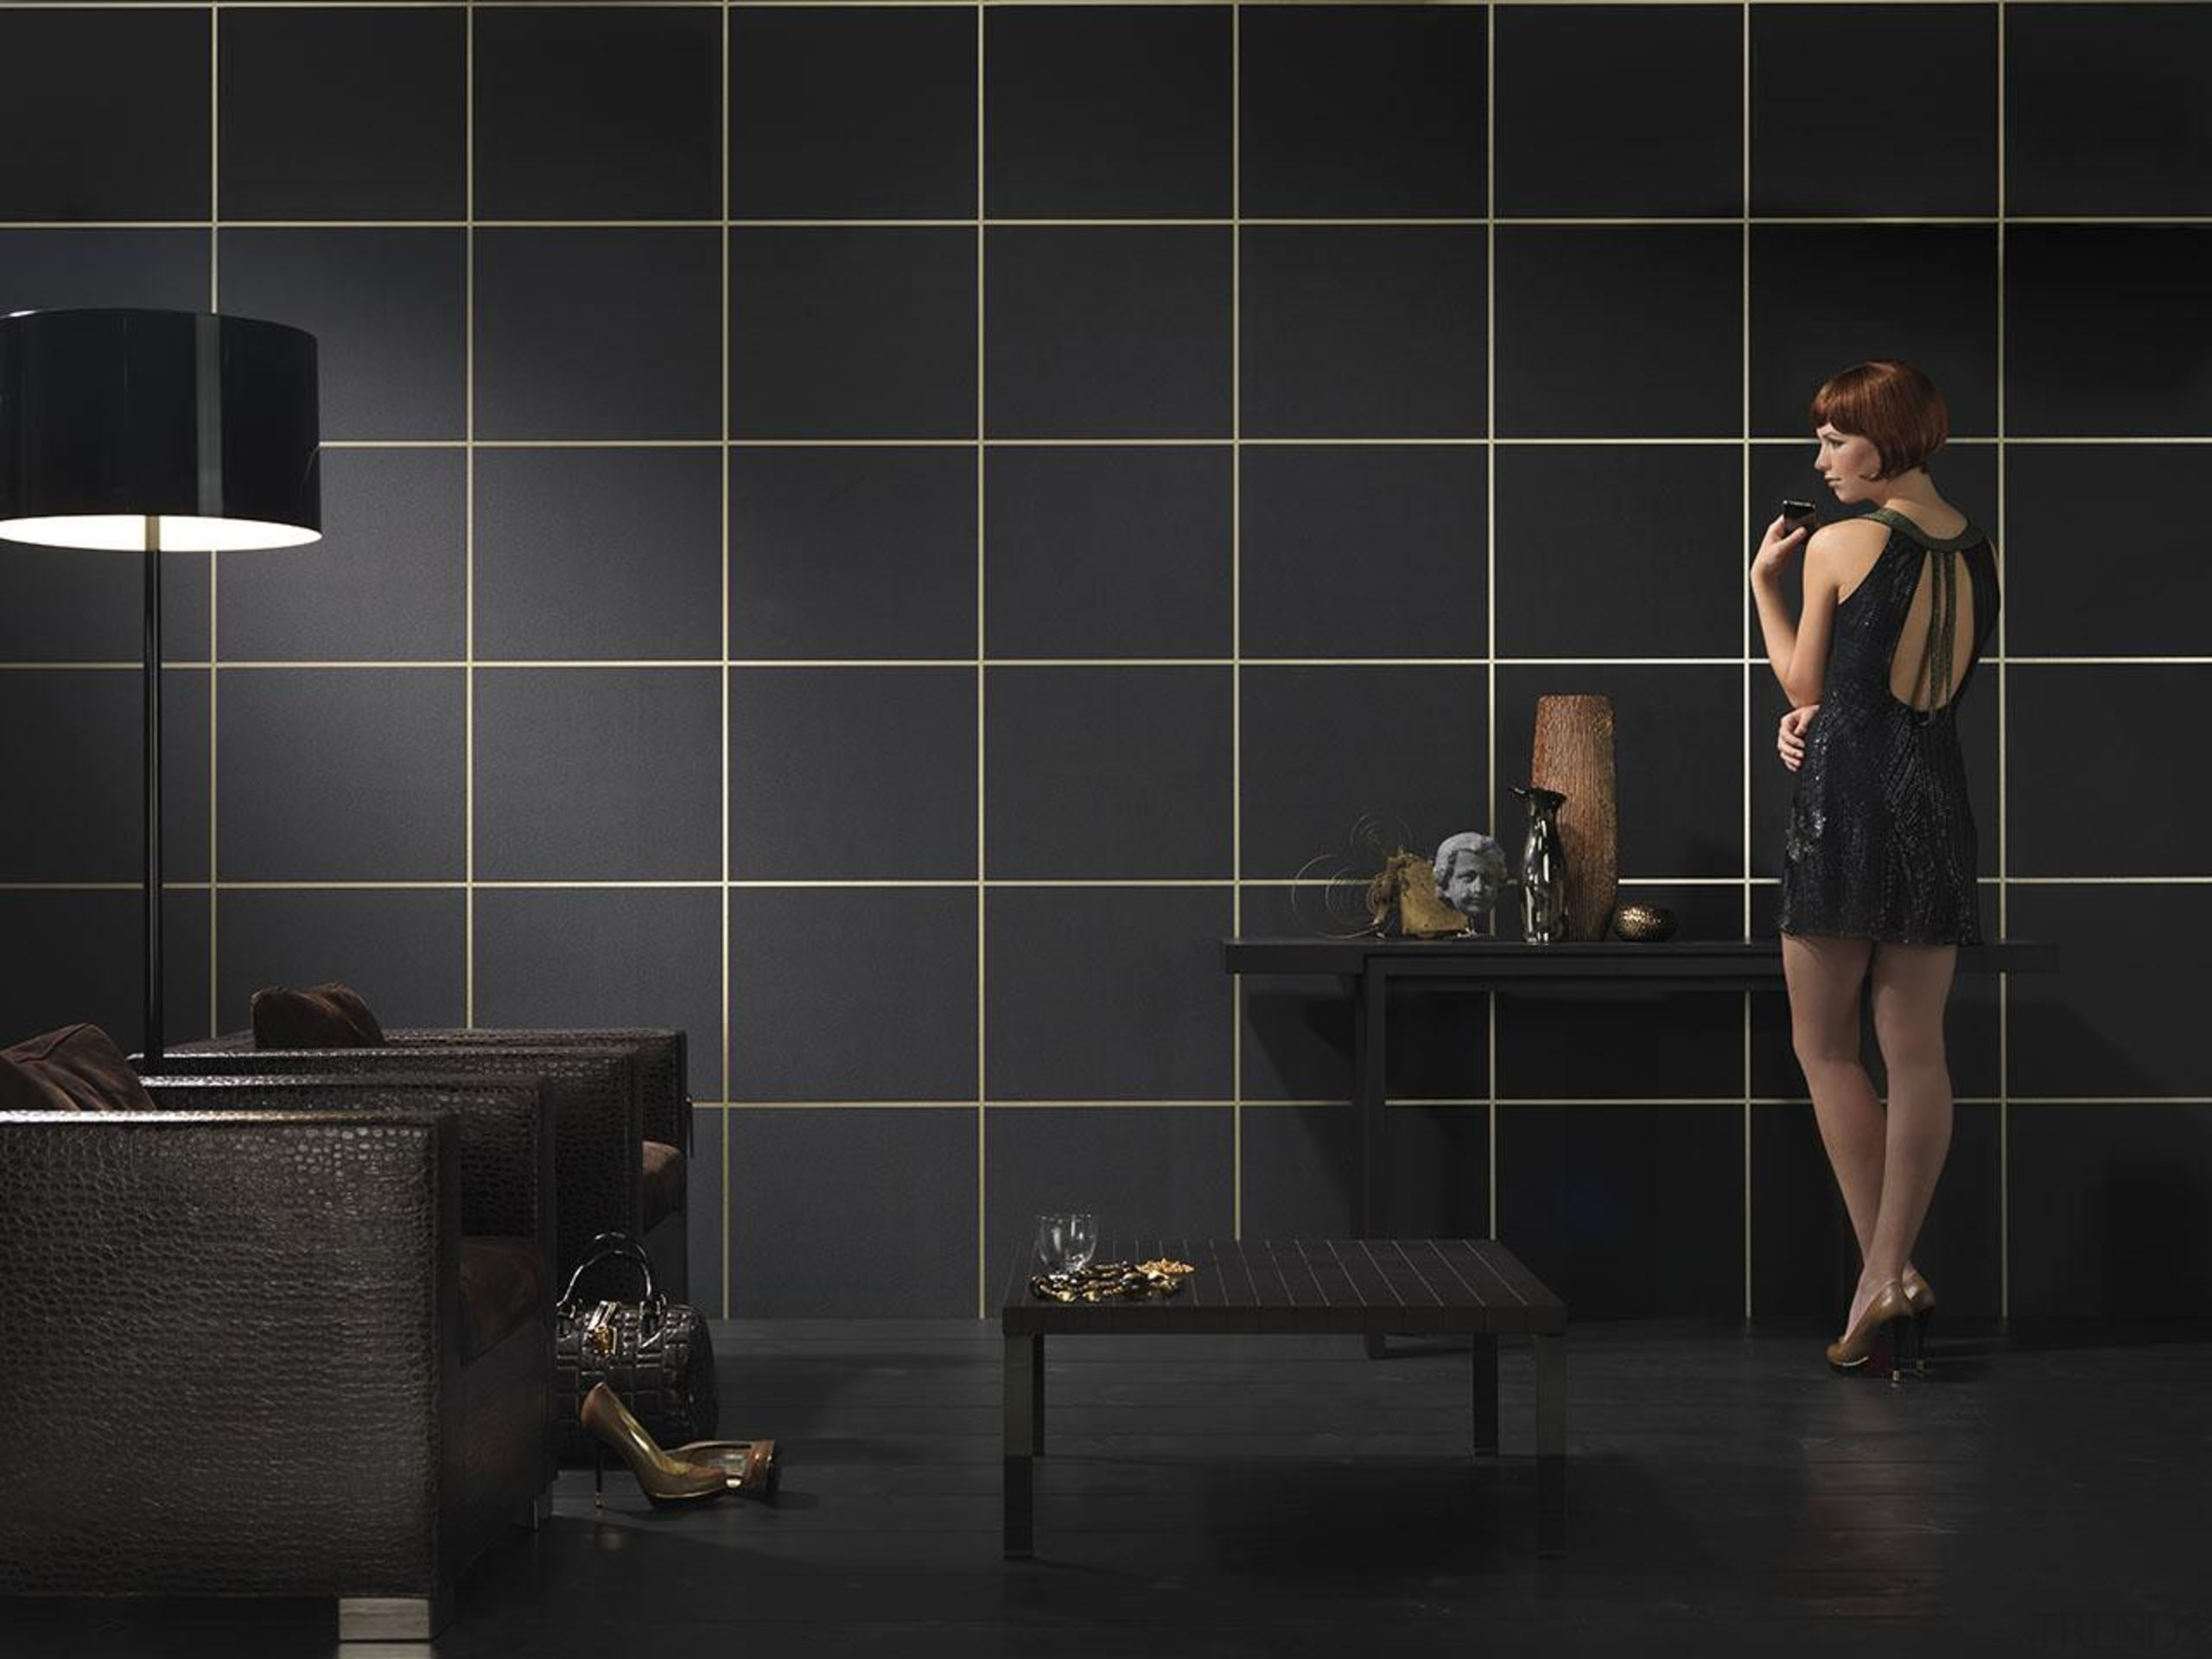 Inspire Range - Inspire Range - bathroom | bathroom, black, floor, flooring, interior design, lighting, room, tile, wall, black